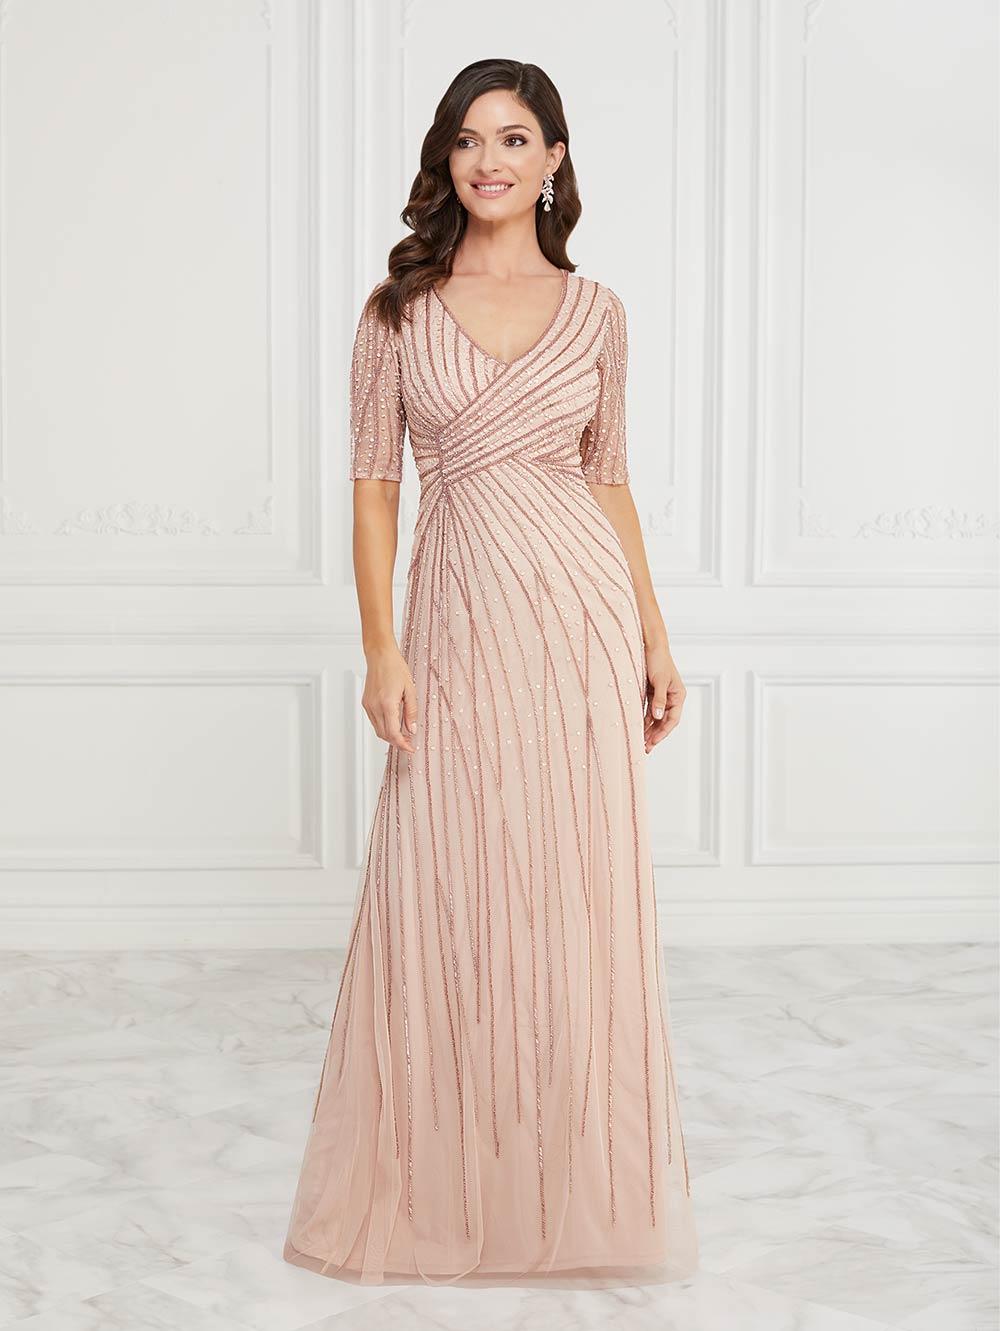 special-occasion-dresses-jacquelin-bridals-canada-27703